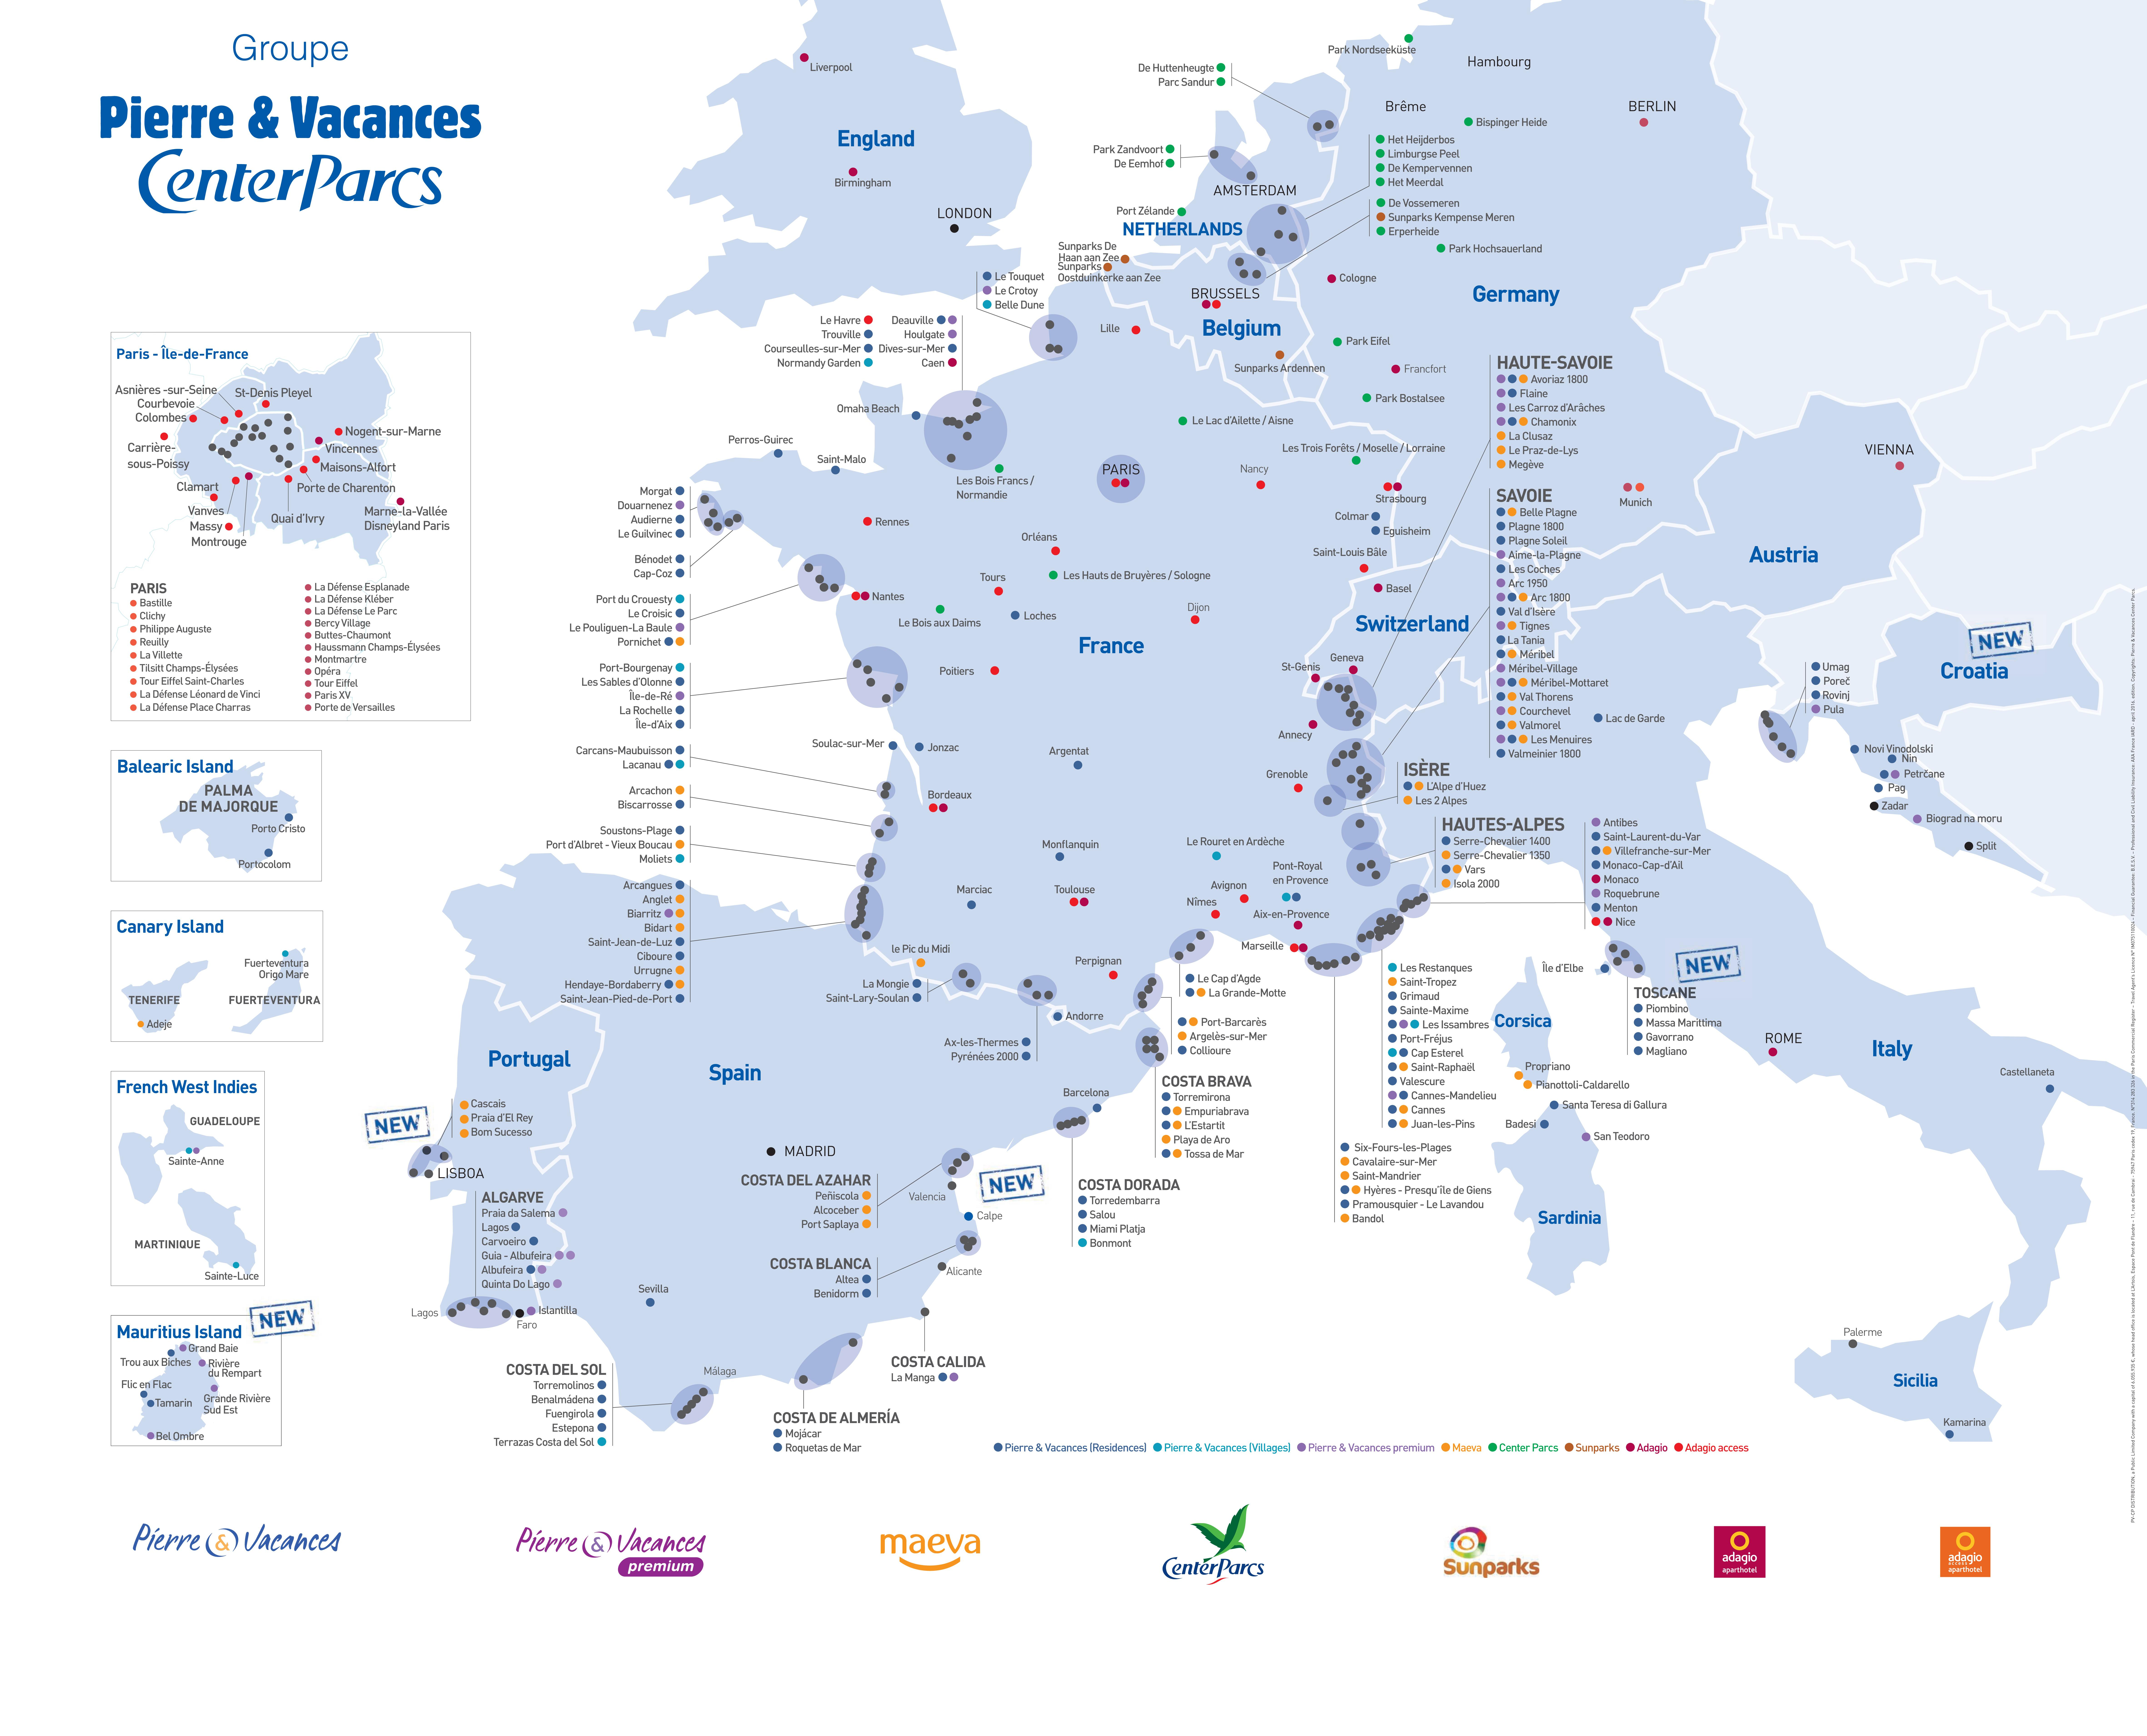 center parcs europe locations map Centre Parcs Europe Map ~ CRIANDIARTES